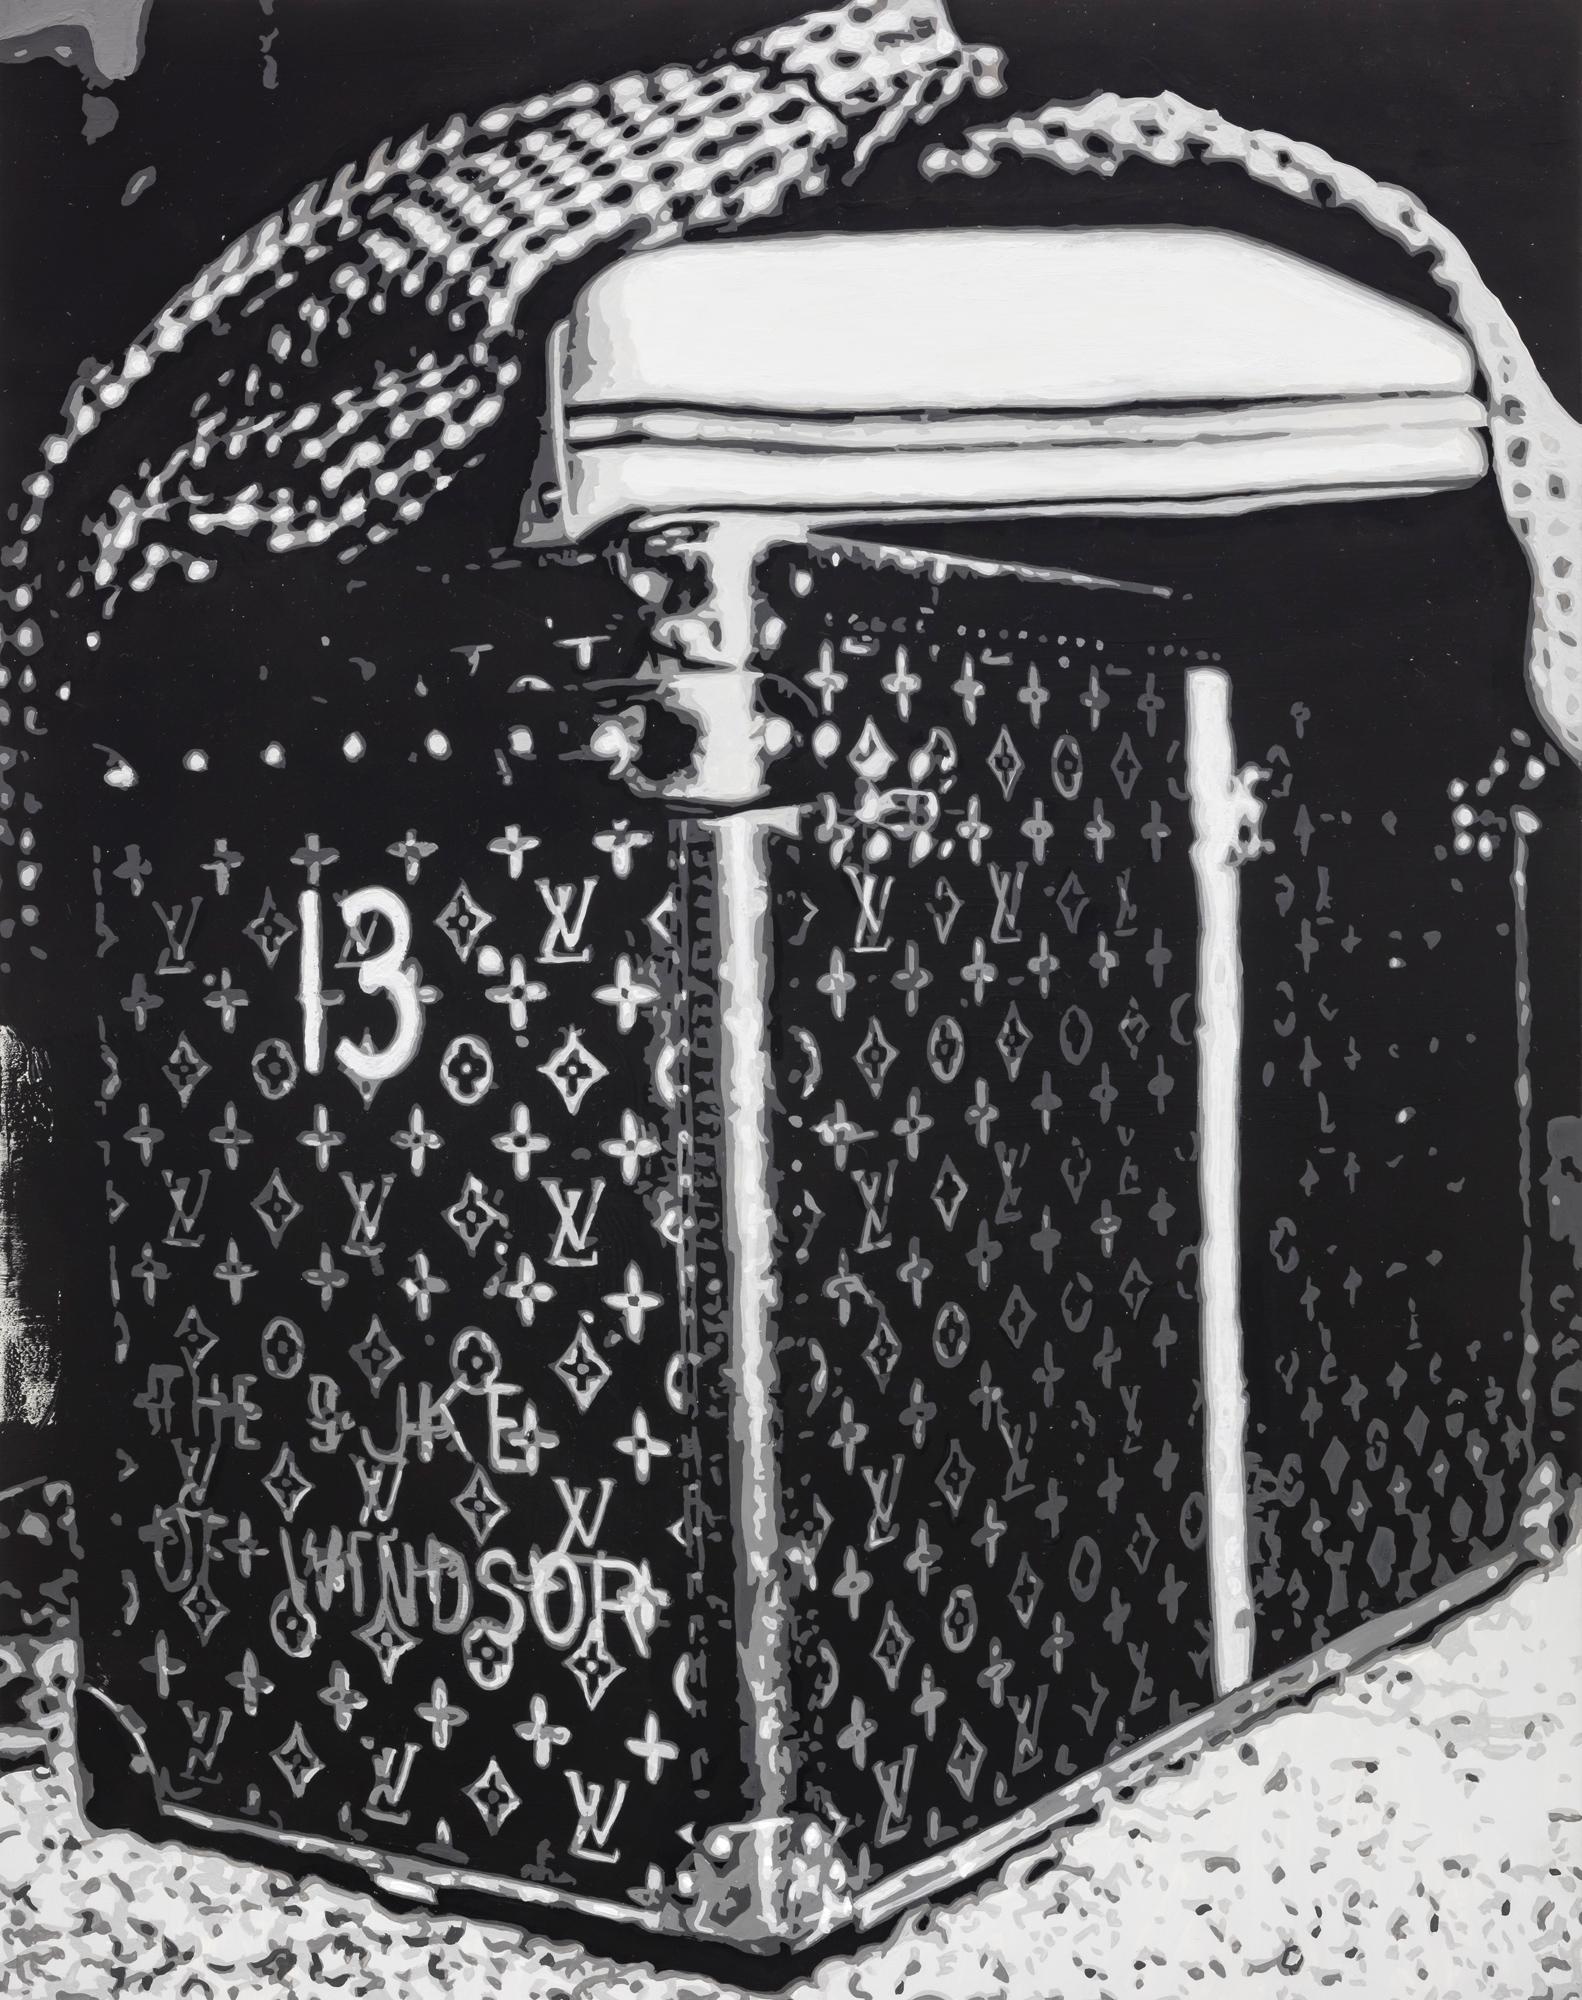 Dorian FitzGerald,  Luggage Trunk, Edward VIII, Duke of Windsor   2019, holbein acryla gouache on board, 14 x 11 inches